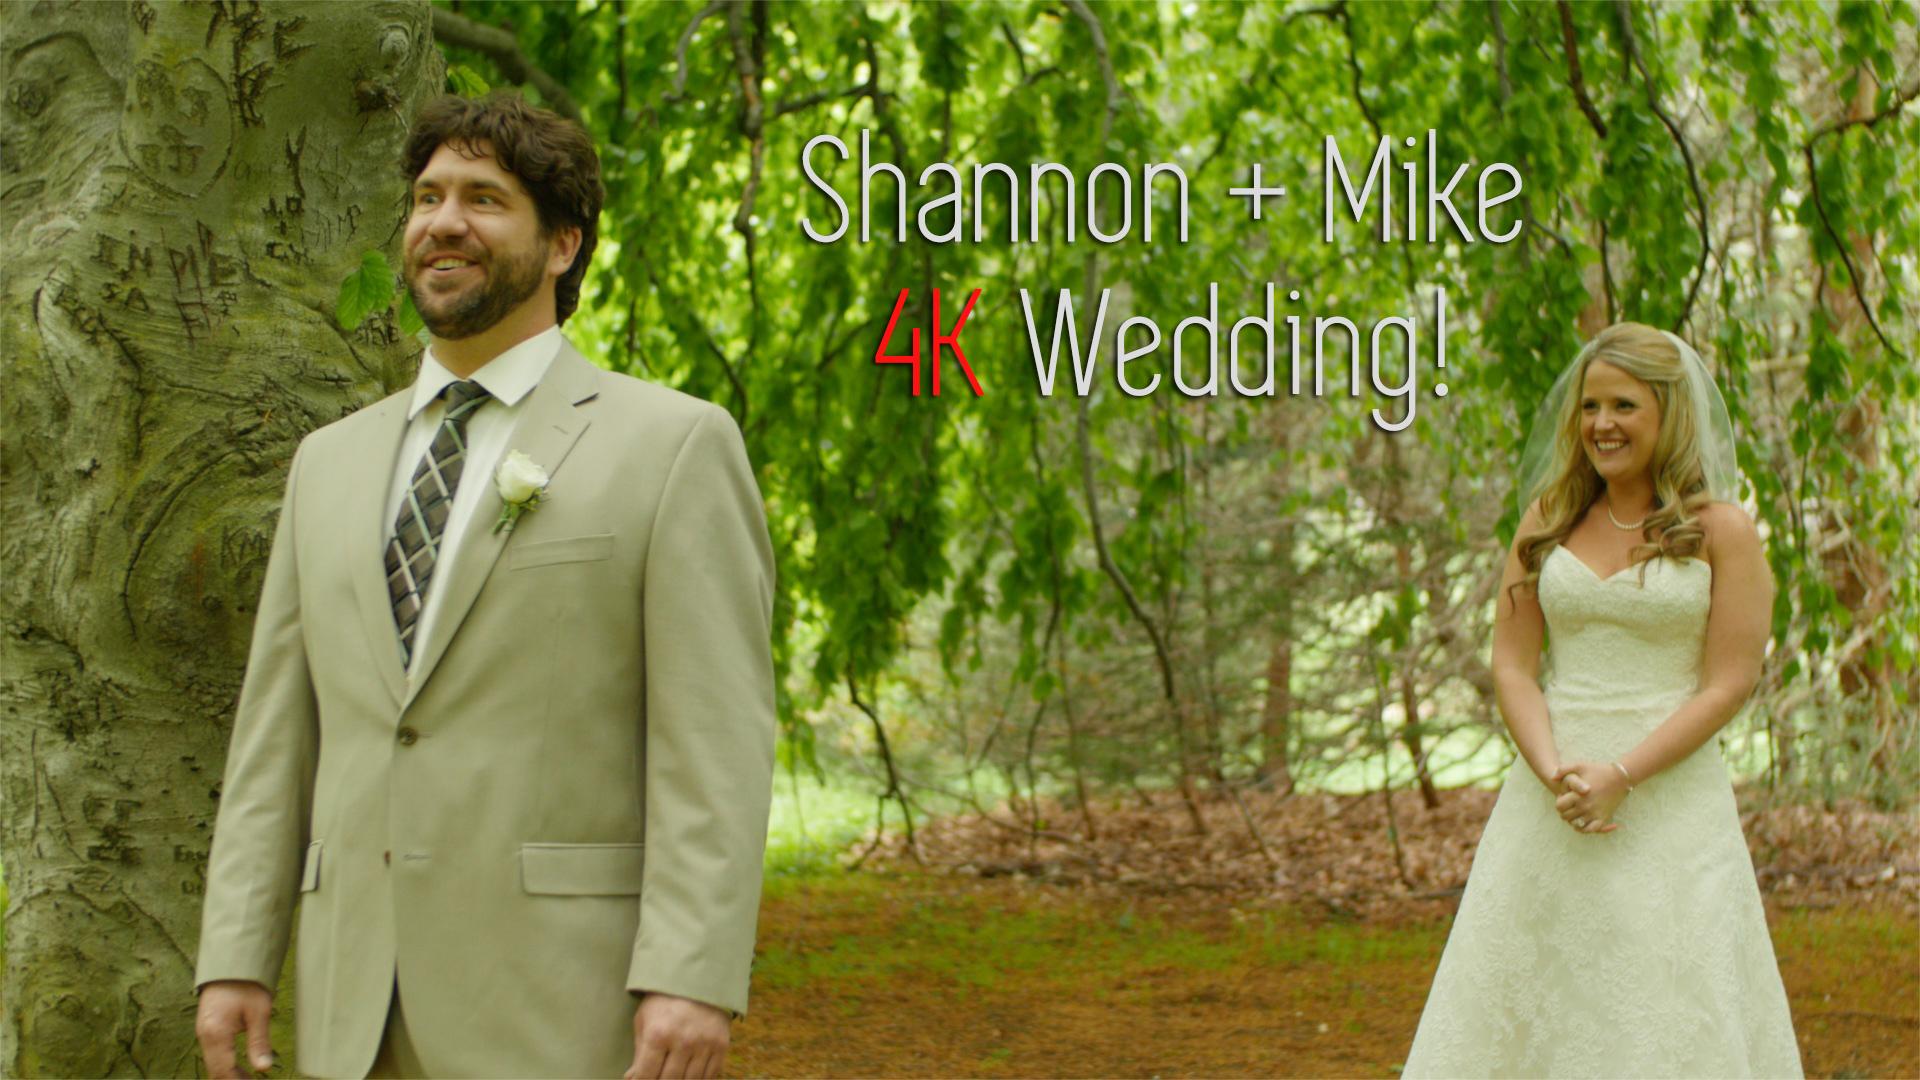 4K Wedding